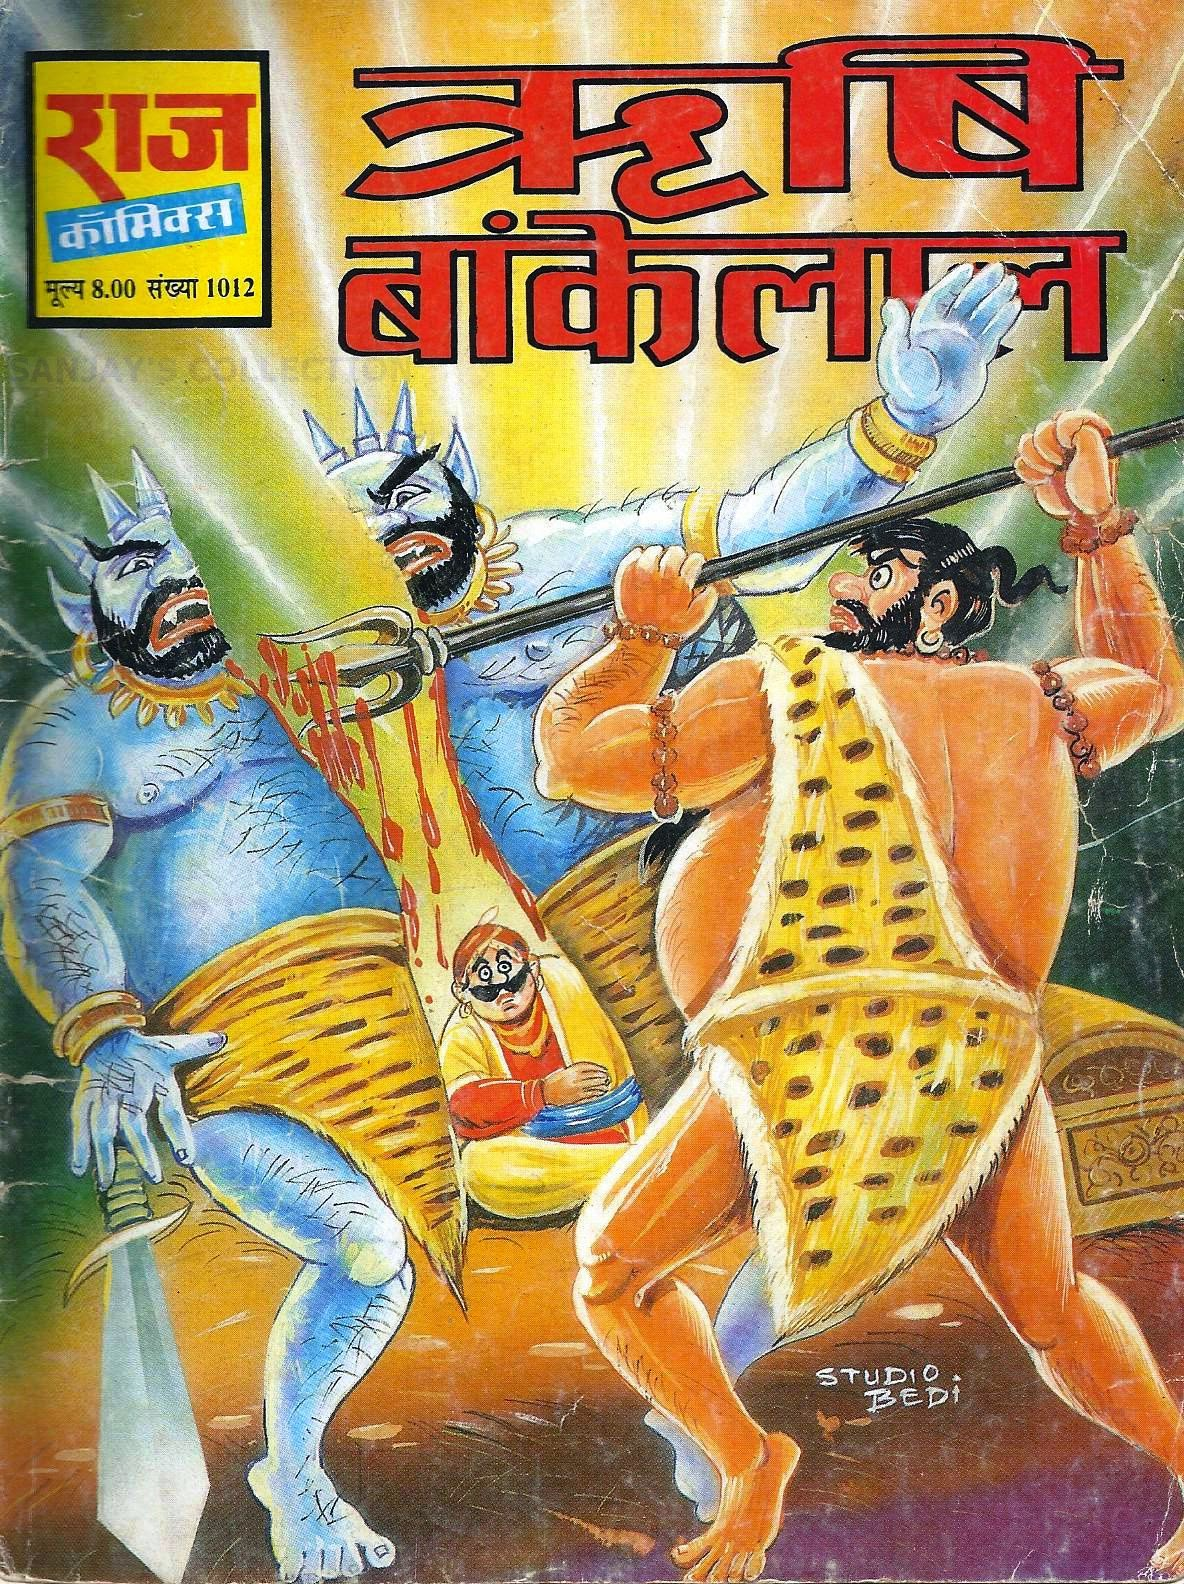 raj comics, hindi comics